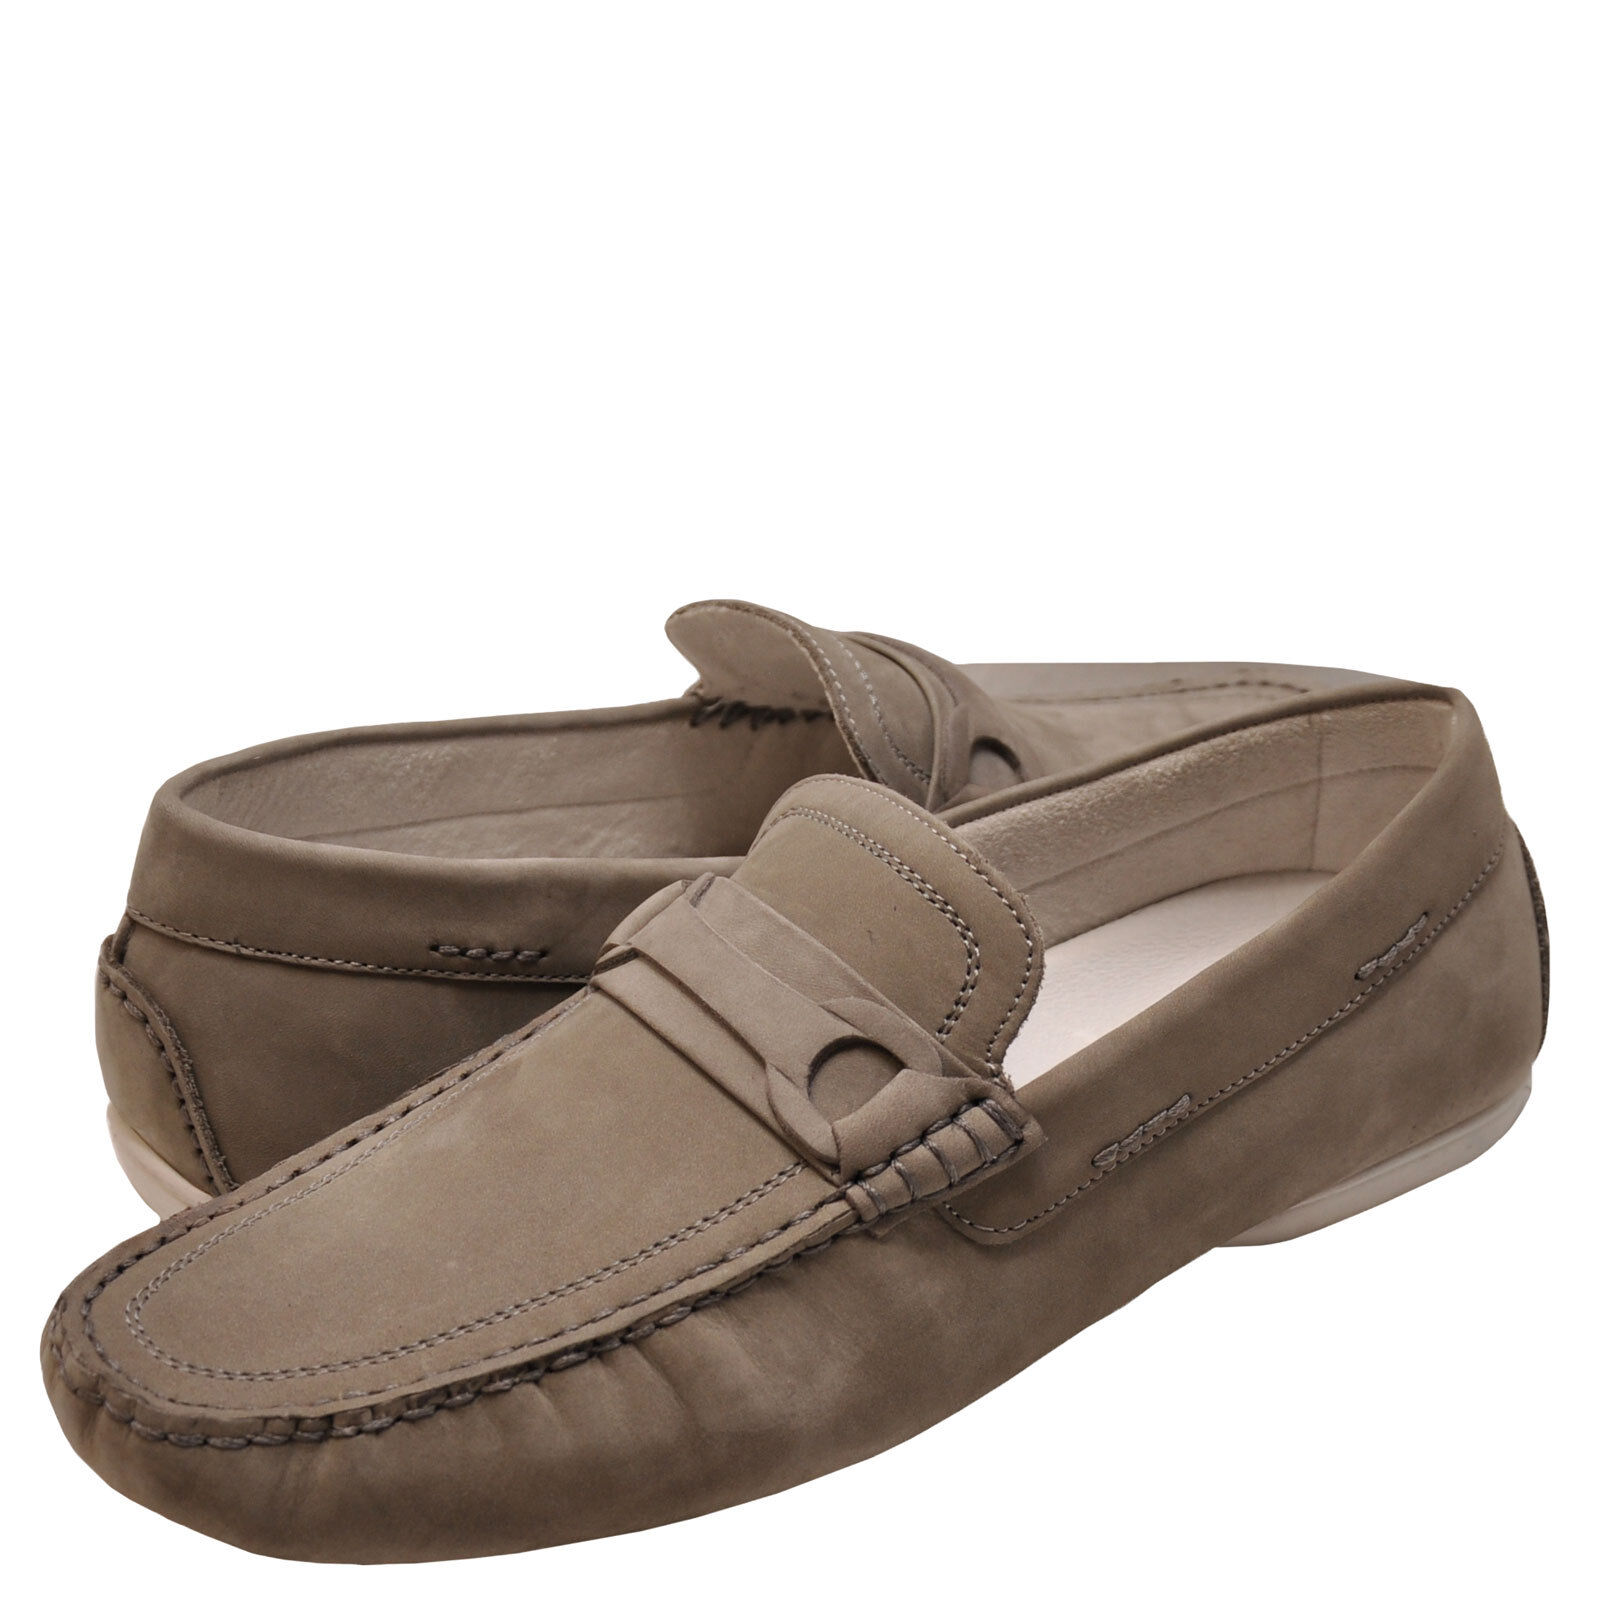 Men's shoes Kenneth Cole Reach Ur Goal Suede Drivers KMS6NU013 Light Grey New